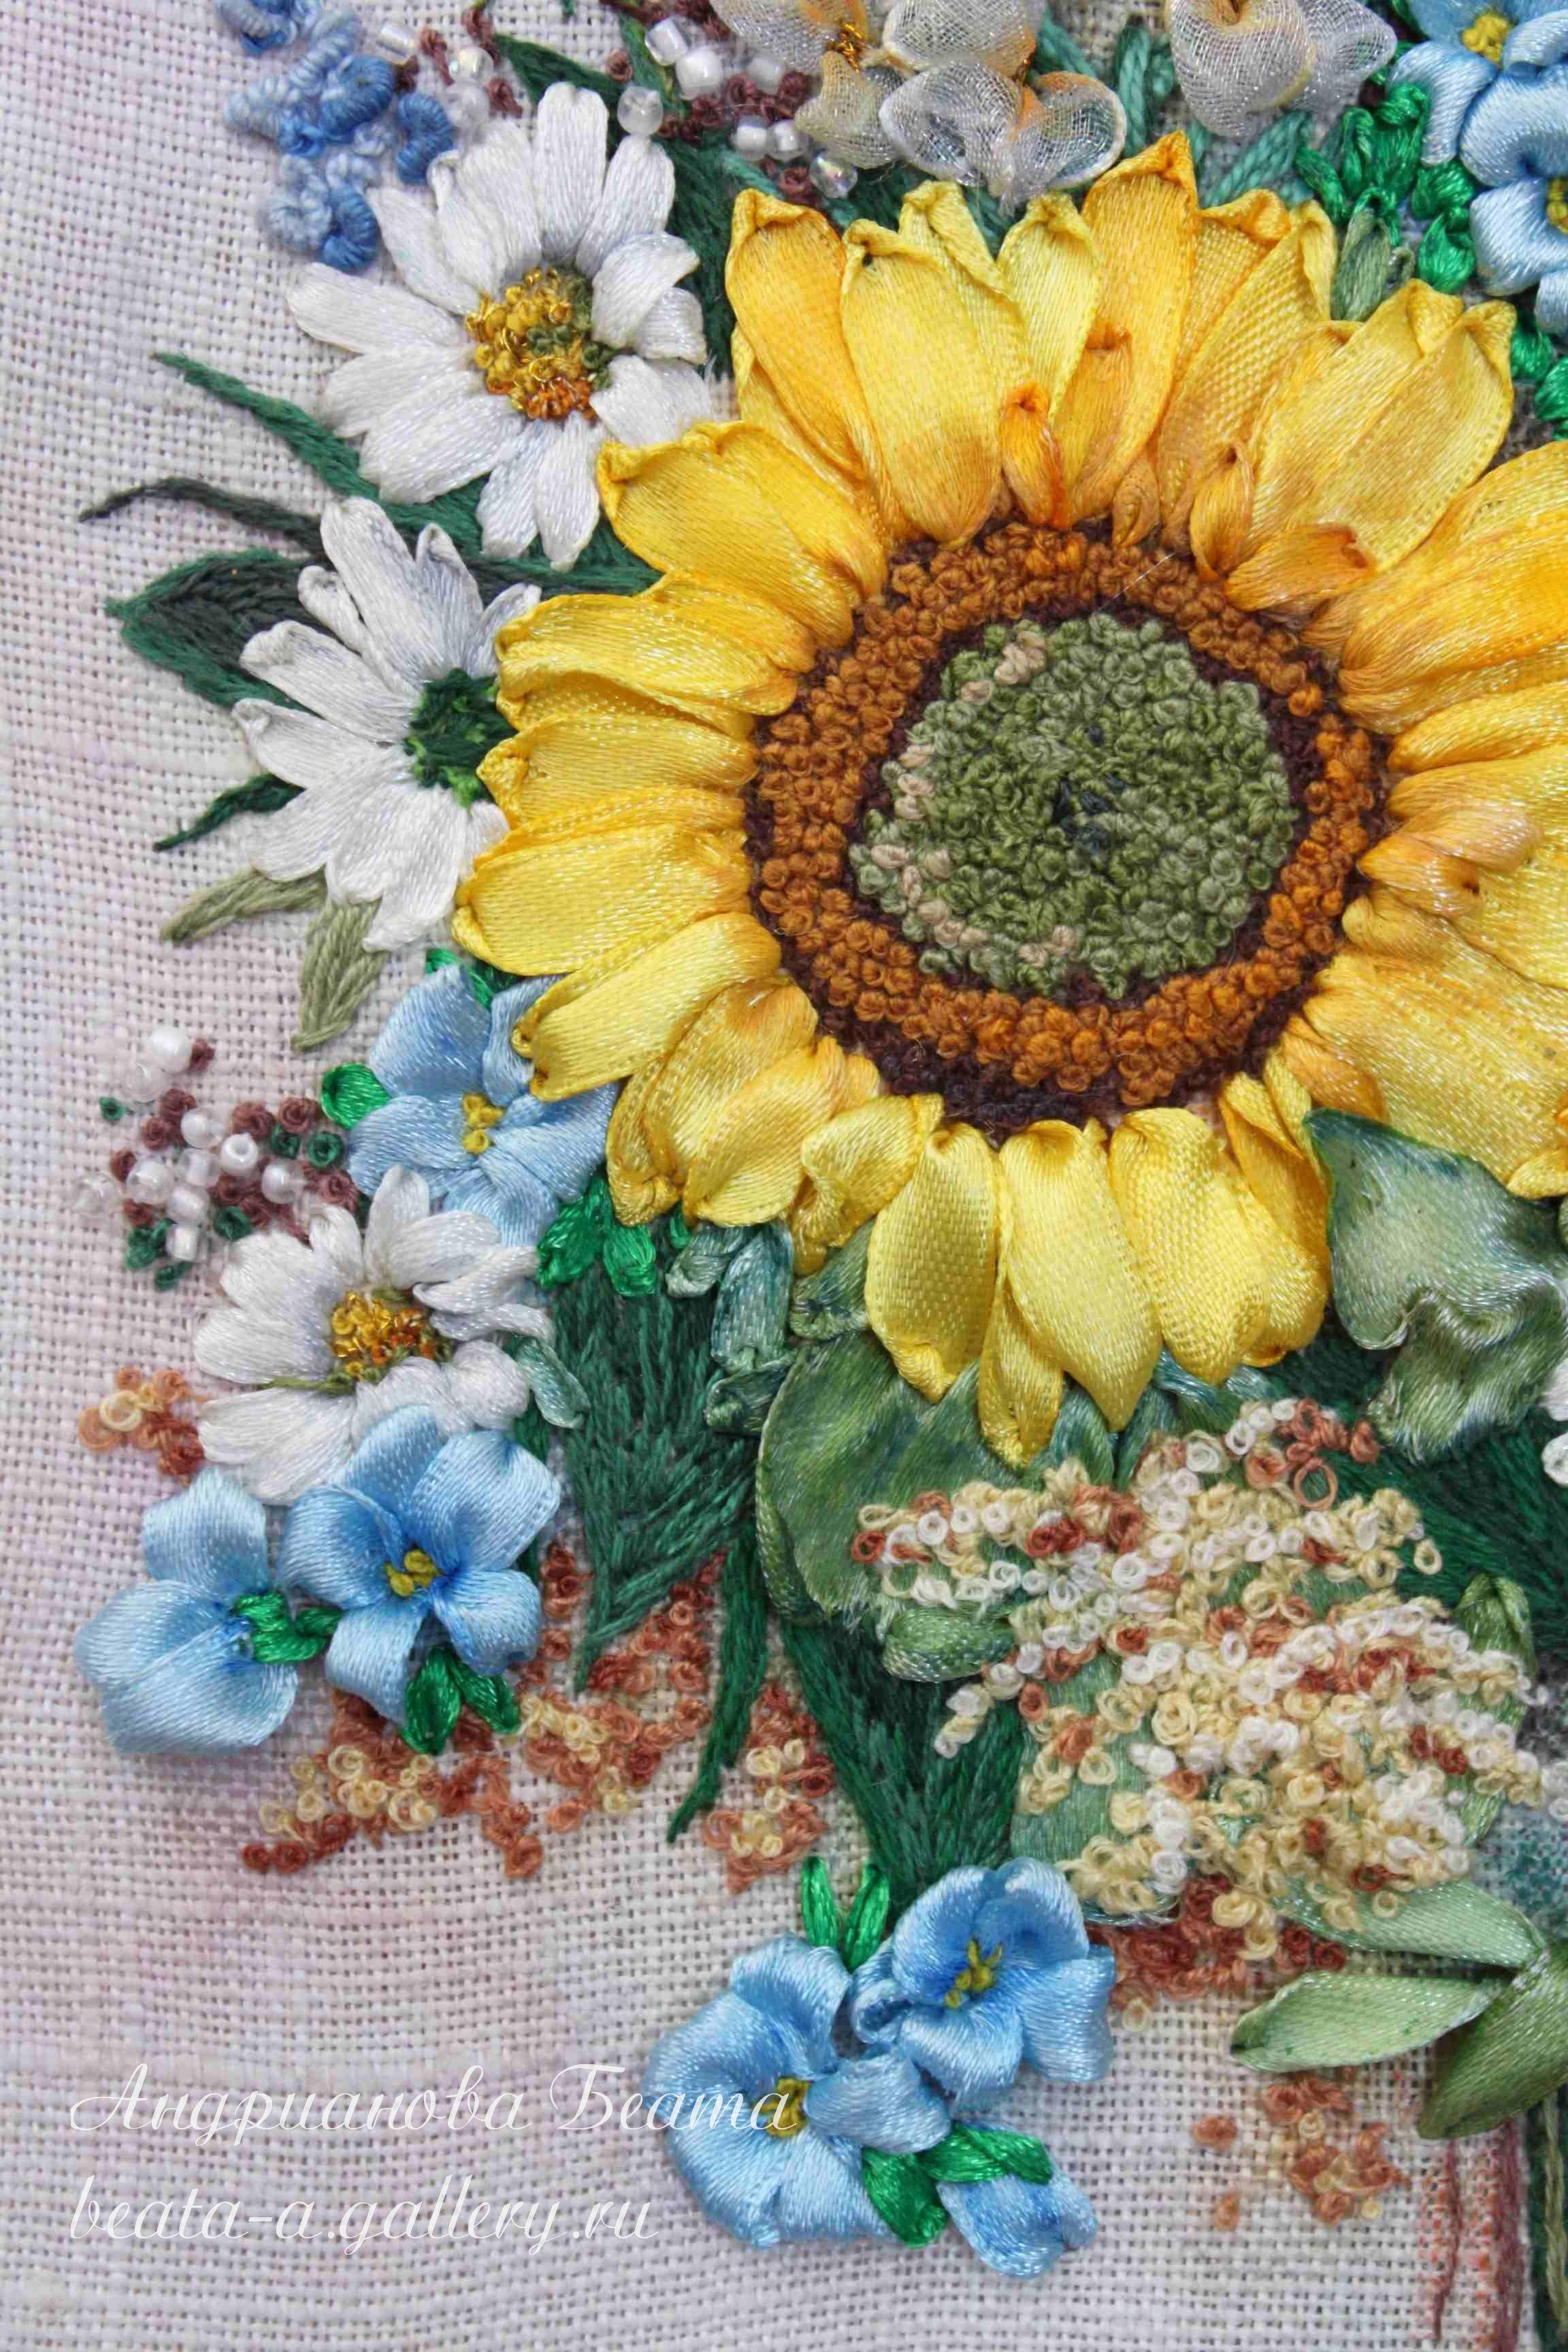 ribbon embroidery, Beata Andrianova, Russia,  http://beata-a.gallery.ru/